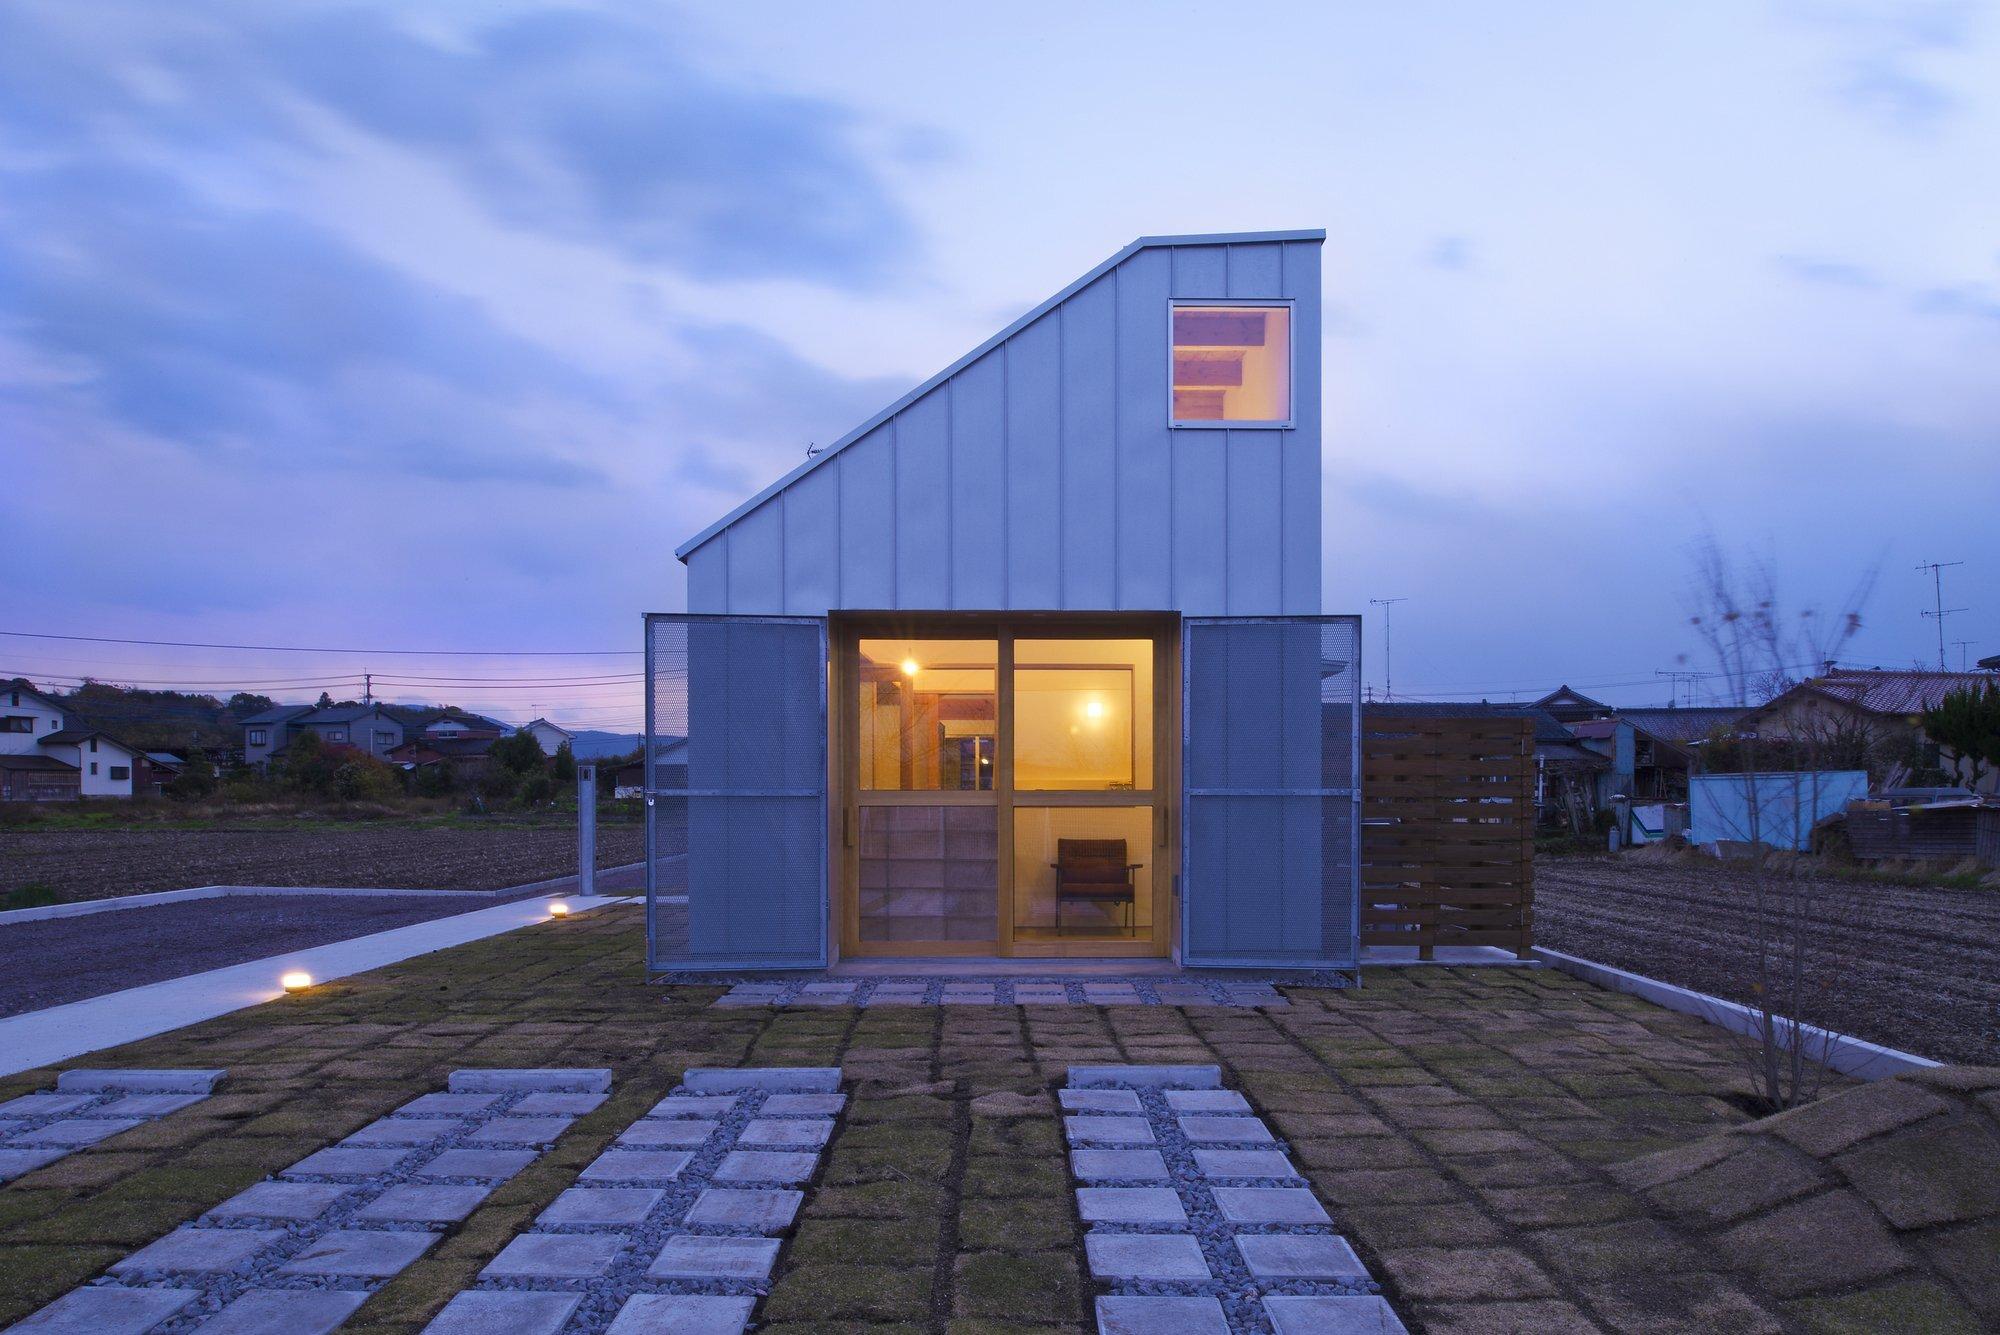 Small Japanese House by Naoko Horibe